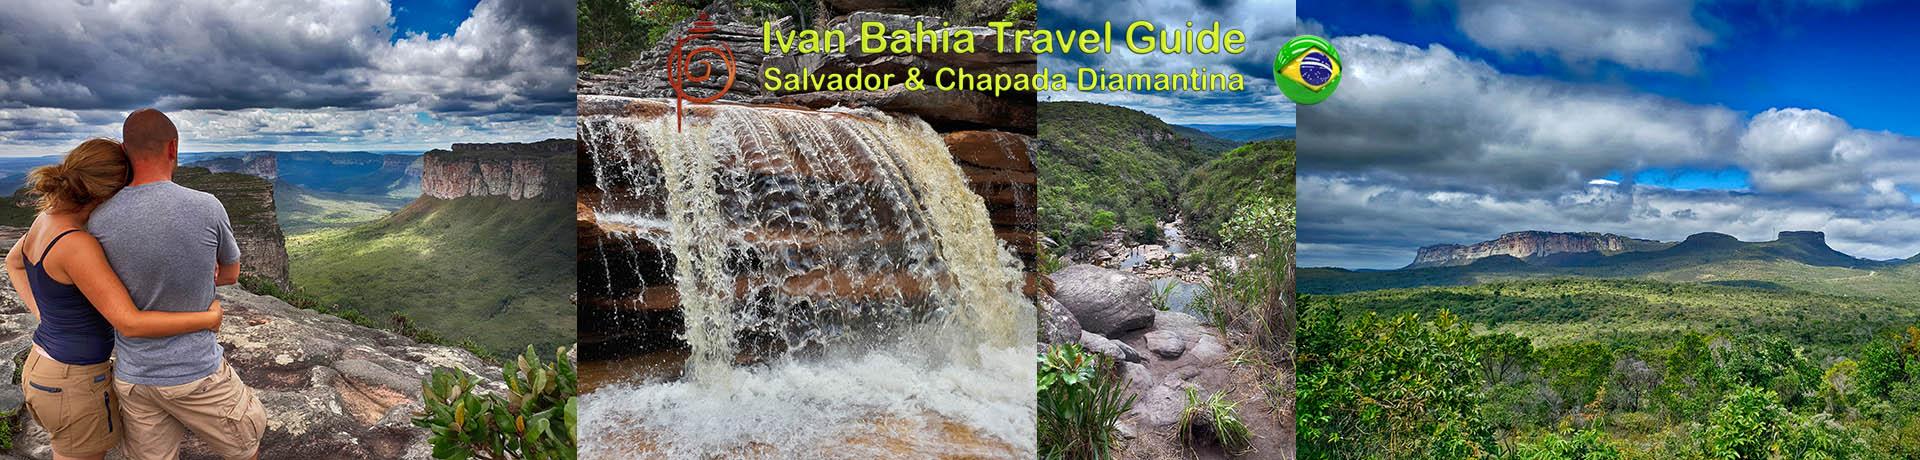 Ivan Bahia Travel Guide, exclusive daytrip from Salvador da Bahia (Brazil) to the Brazilian Grand Canyon / Chapada Diamantina National Park, #ivanbahia #ivanbahiaguide #toursbylocals @fernandobingre #bahiametisse #ssalovers #ivanbahiatravelguide #chapadadiamantina #BrazilianGrandCanyon #ivanbahiareisgids #BrazilieReisGids #ChapadaDiamantinaGuide #ChapadaDiamantina #chapadadiamantinatrekking #chapadatrekking #toursbylocals #toursbylocalsguide #tripadvisorbahia #tripadvisorsalvador #reisgids #ValeDoPati #ValeDoPatibr #ValeDoPatitrekking #ValeDoPatichapada #BrazilieReis #guiachapadadiamantina #chapadaadventuredaniel #gaytravelbrazil #lgbtq+friendly #instagay #gaytravelinfo #gayhoneymoon #gayholiday #lgbttravel #lgbtqfriendly #lgbttourism #lgbtq #lgbtqtravel #gayworldwide #gaytravelguide #gaytravelinsta #gayworld #gaystraveltoo #thegaypassport #gaytravelers #wearetravelgays #gaycation #gaytravellers #gaytravel #gaytravelinsta #gaytourist #lgbtqtravelers